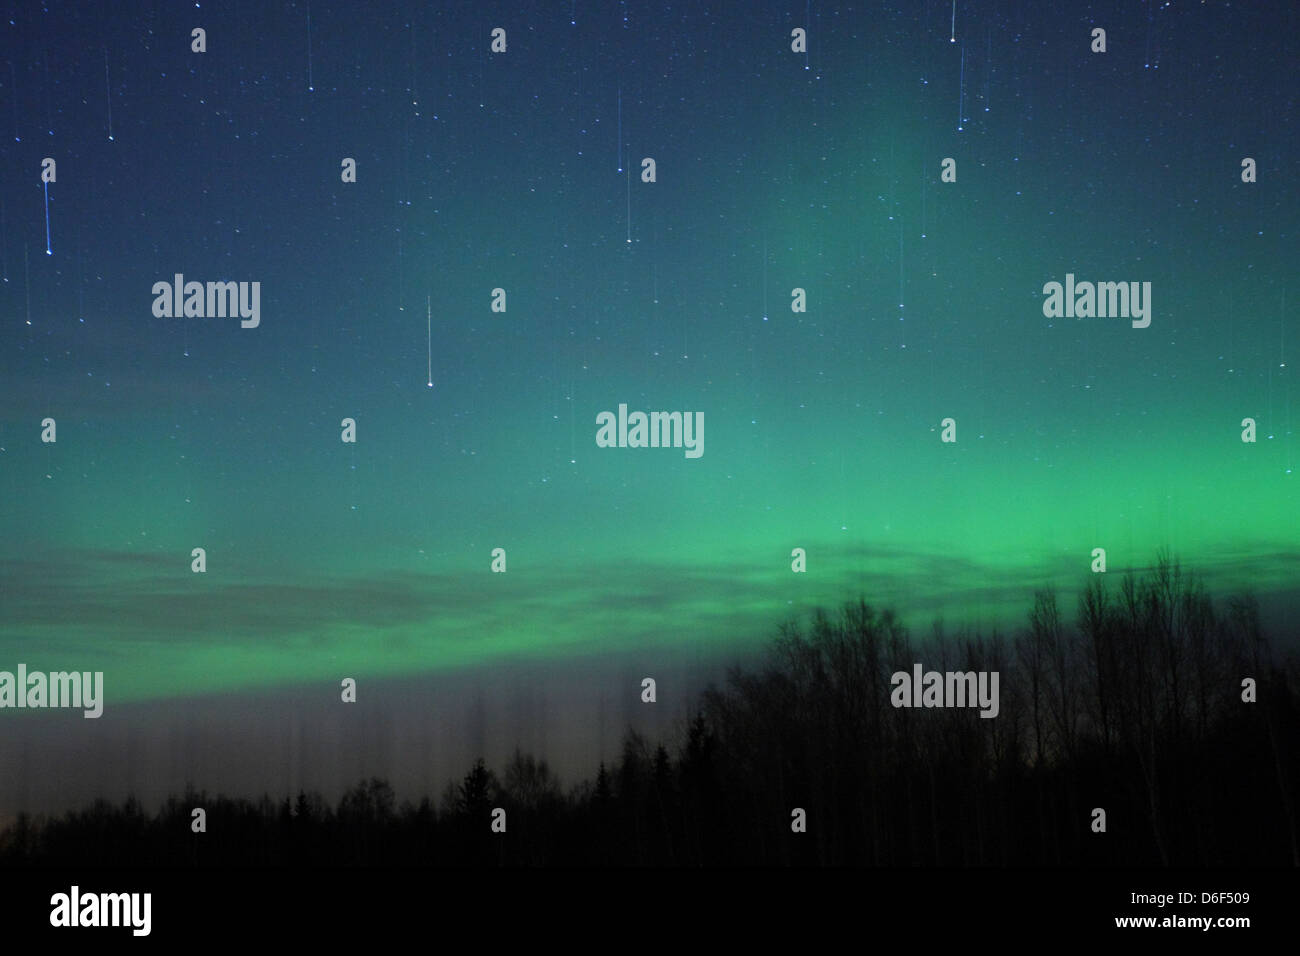 Falling stars and Northern lights (Aurora Borealis) in the sky. Europe, Estonia Stock Photo